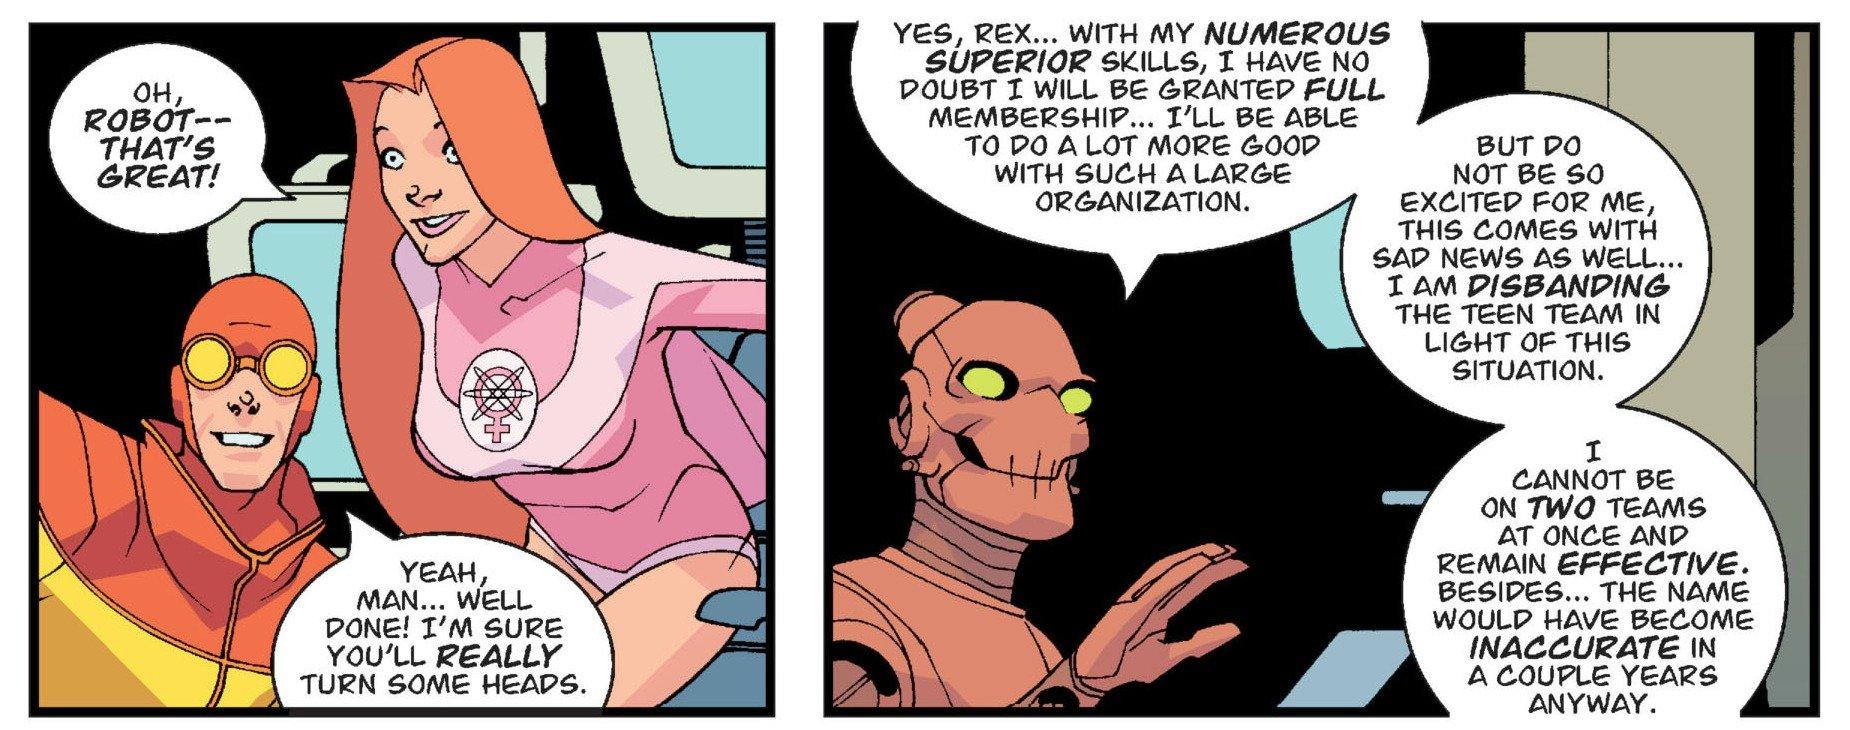 Invincible 006 Robot Superior